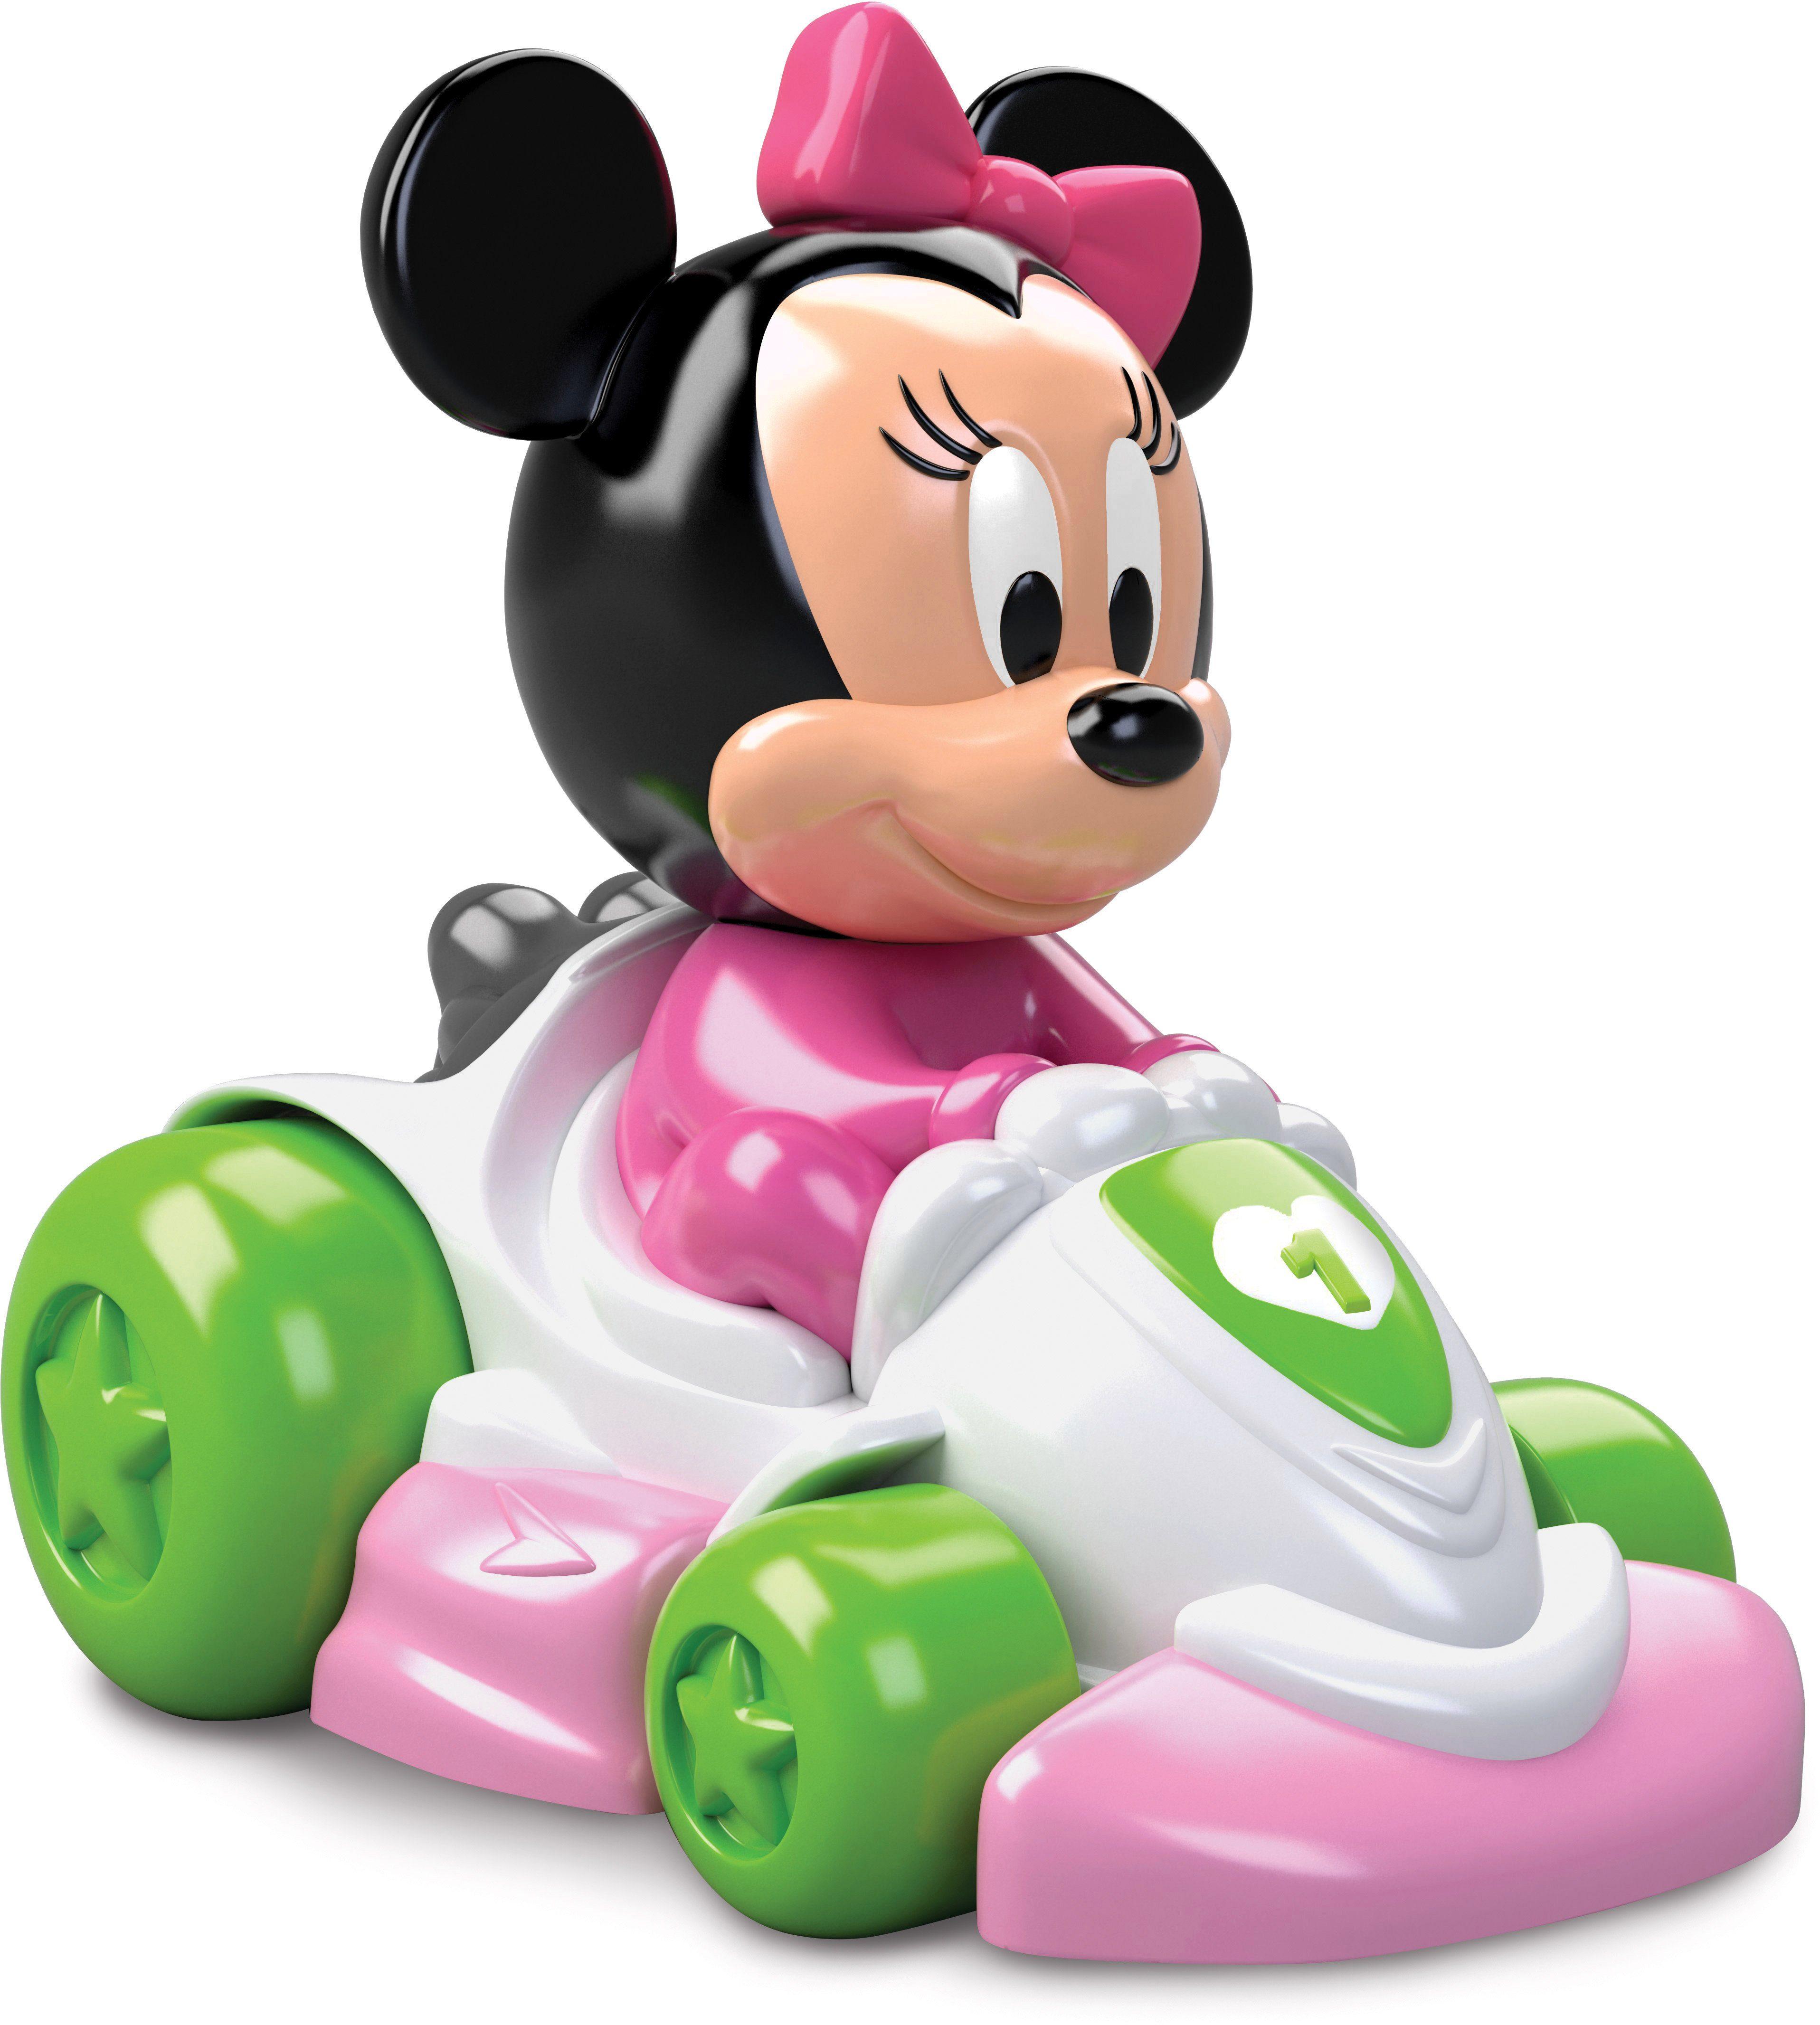 Clementoni Spielauto, »Disney baby, Baby Minnie Go Kart«